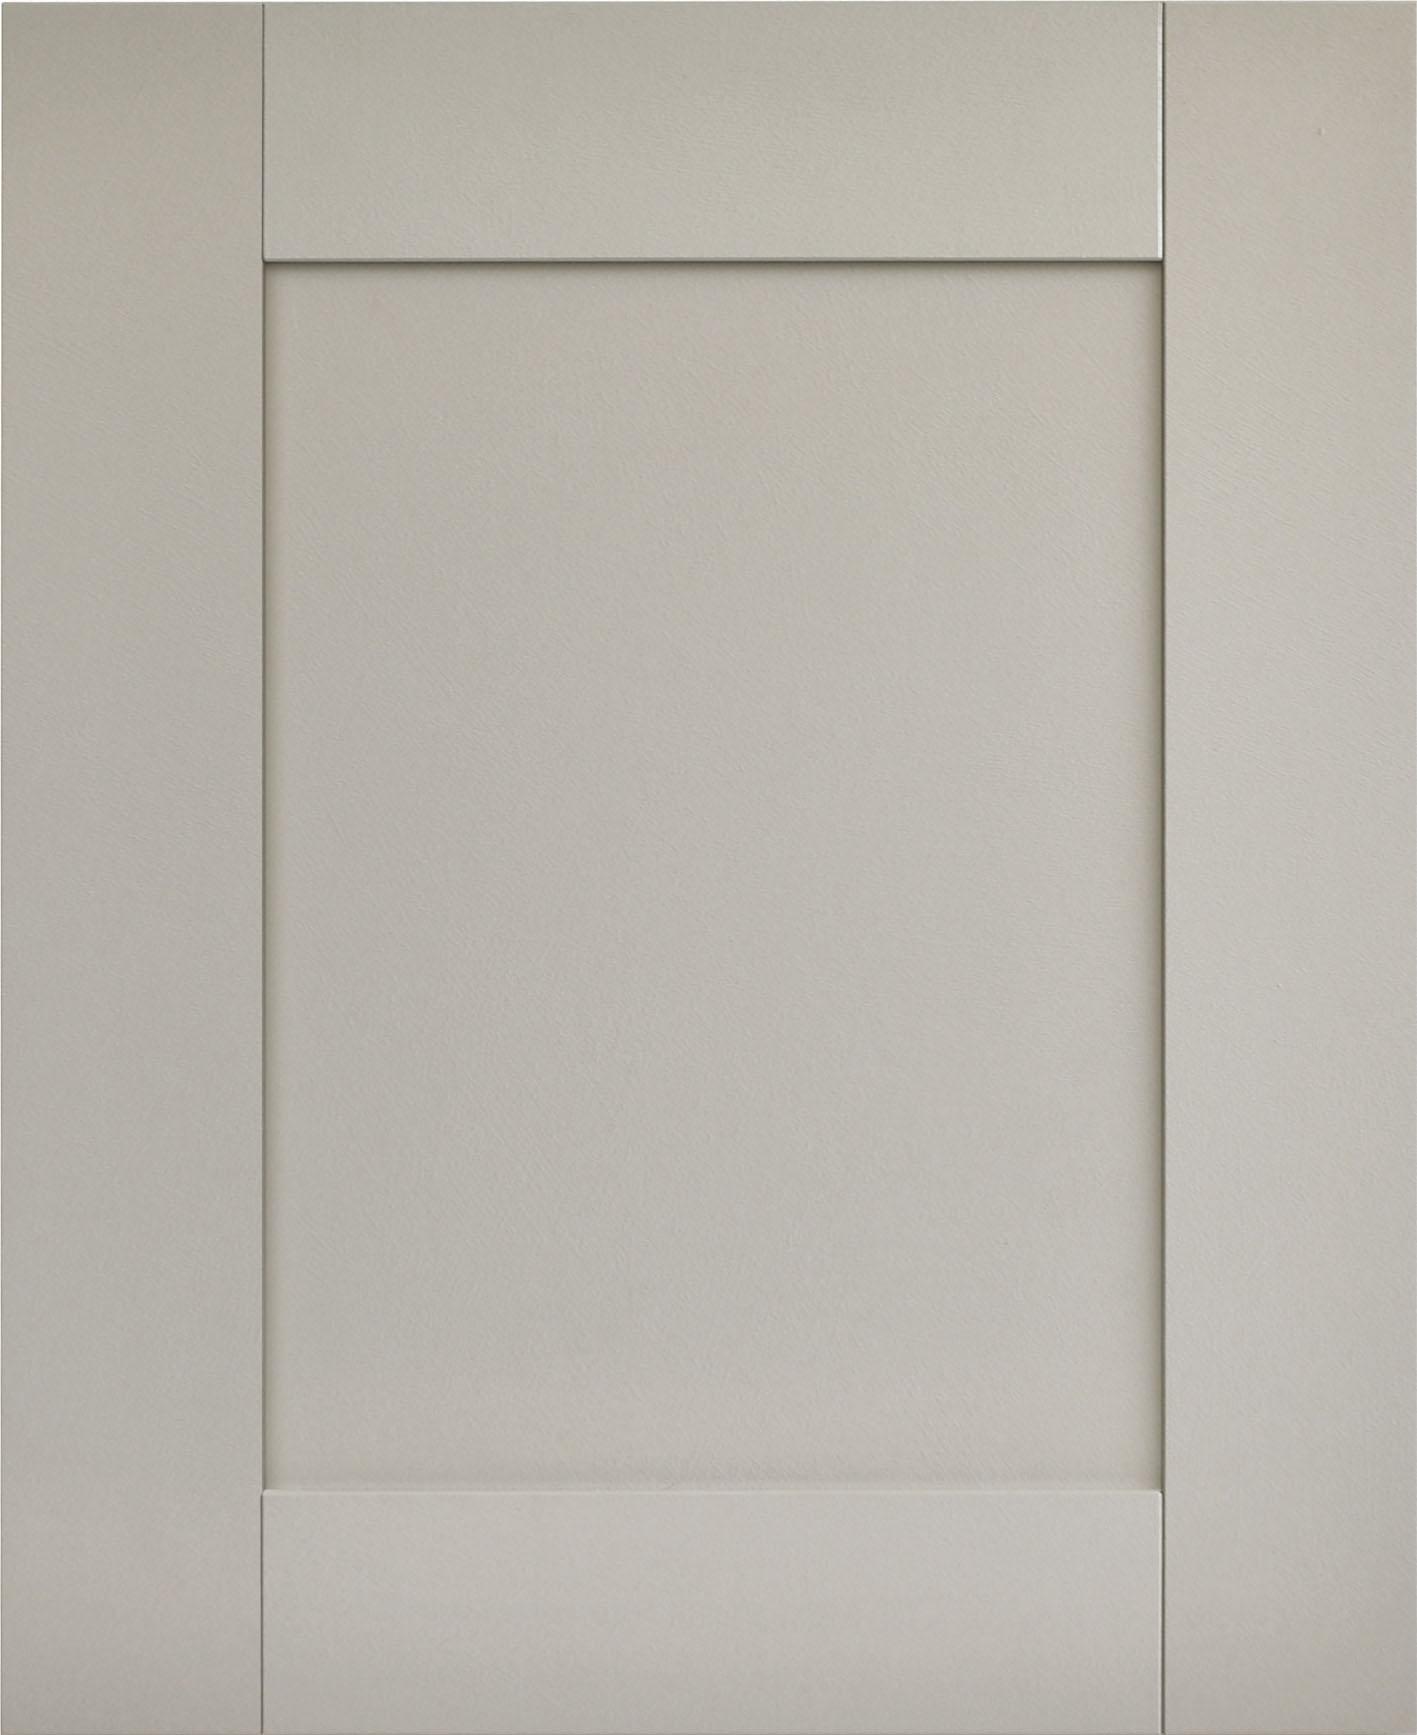 Square Frame 2206-SQ